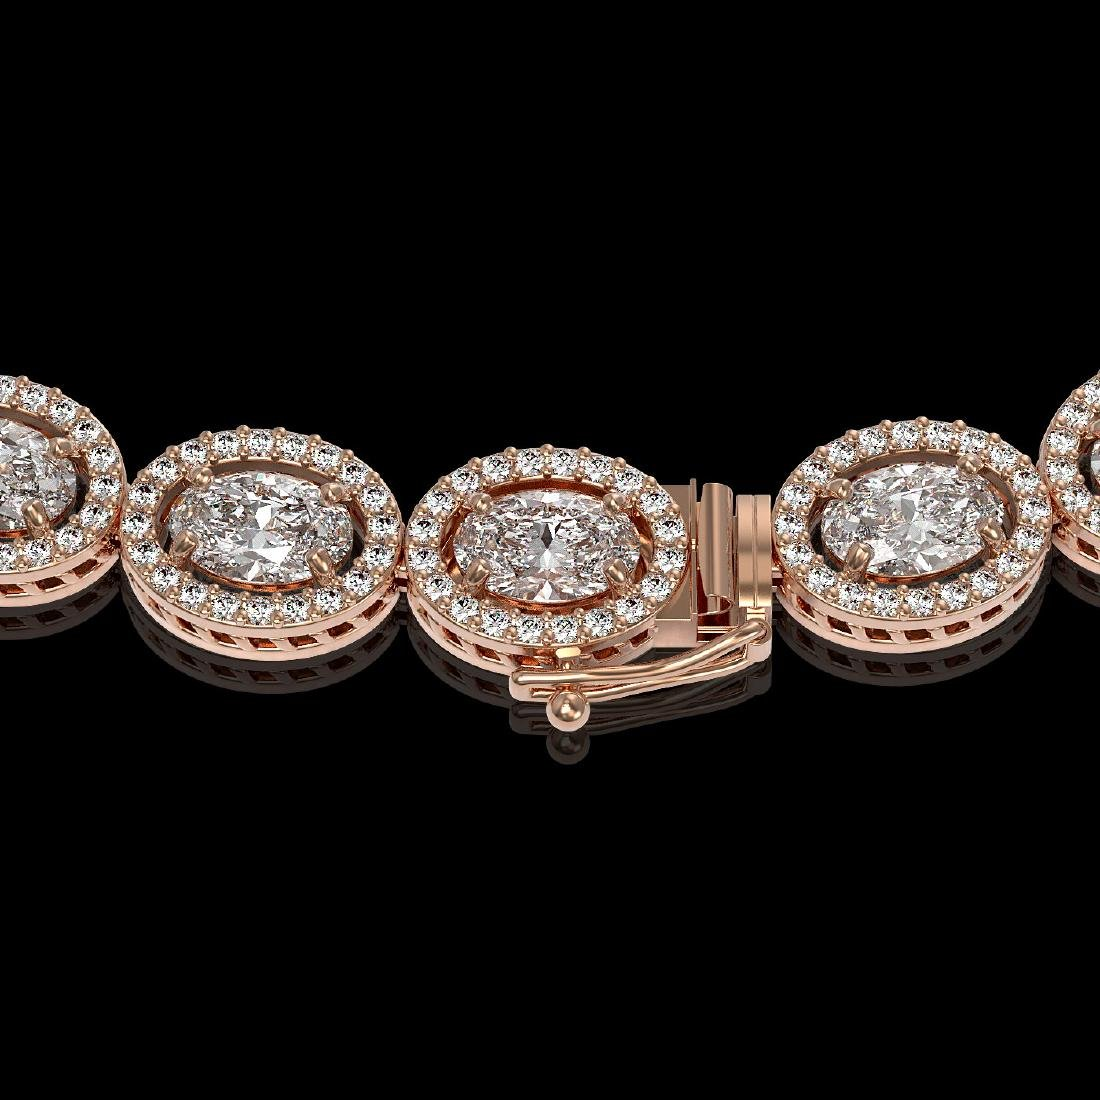 30.41 CTW Oval Diamond Designer Necklace 18K Rose Gold - 3